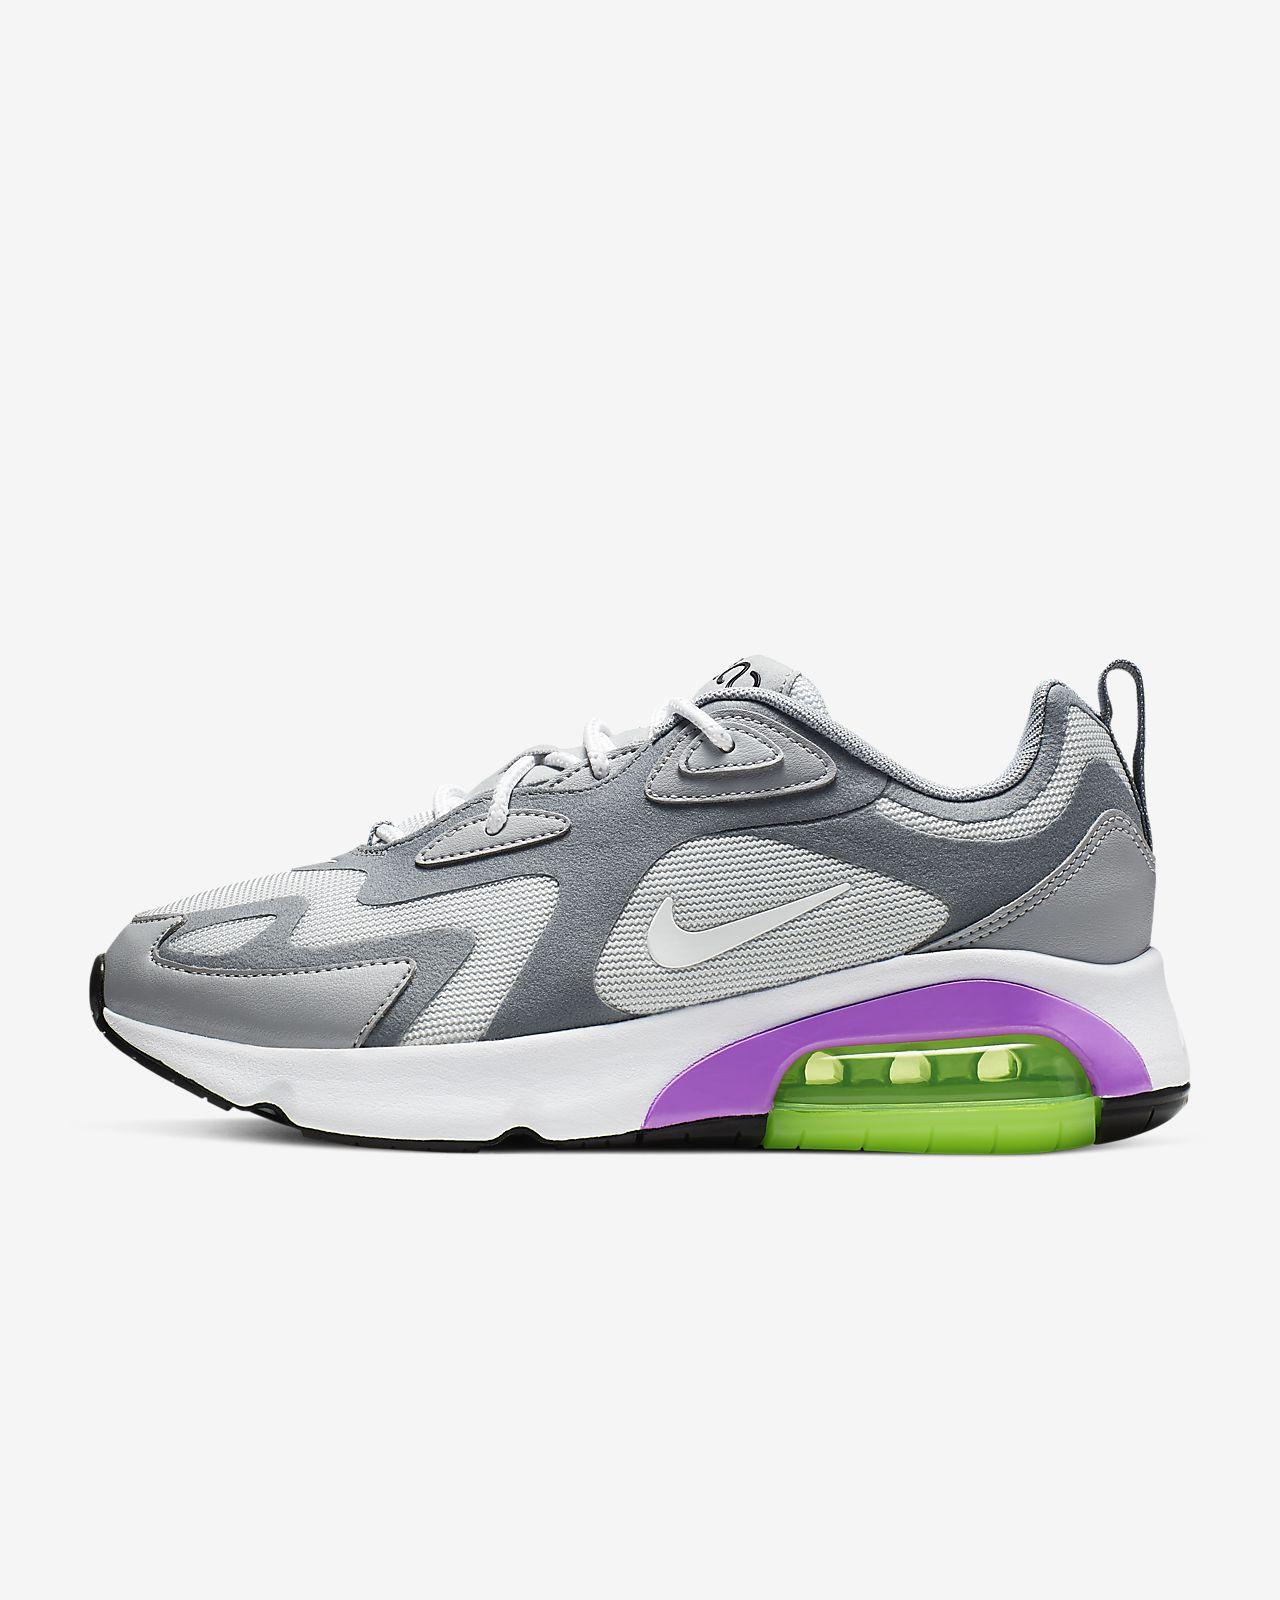 Nike air max thea noir anthracite blanc loup gris